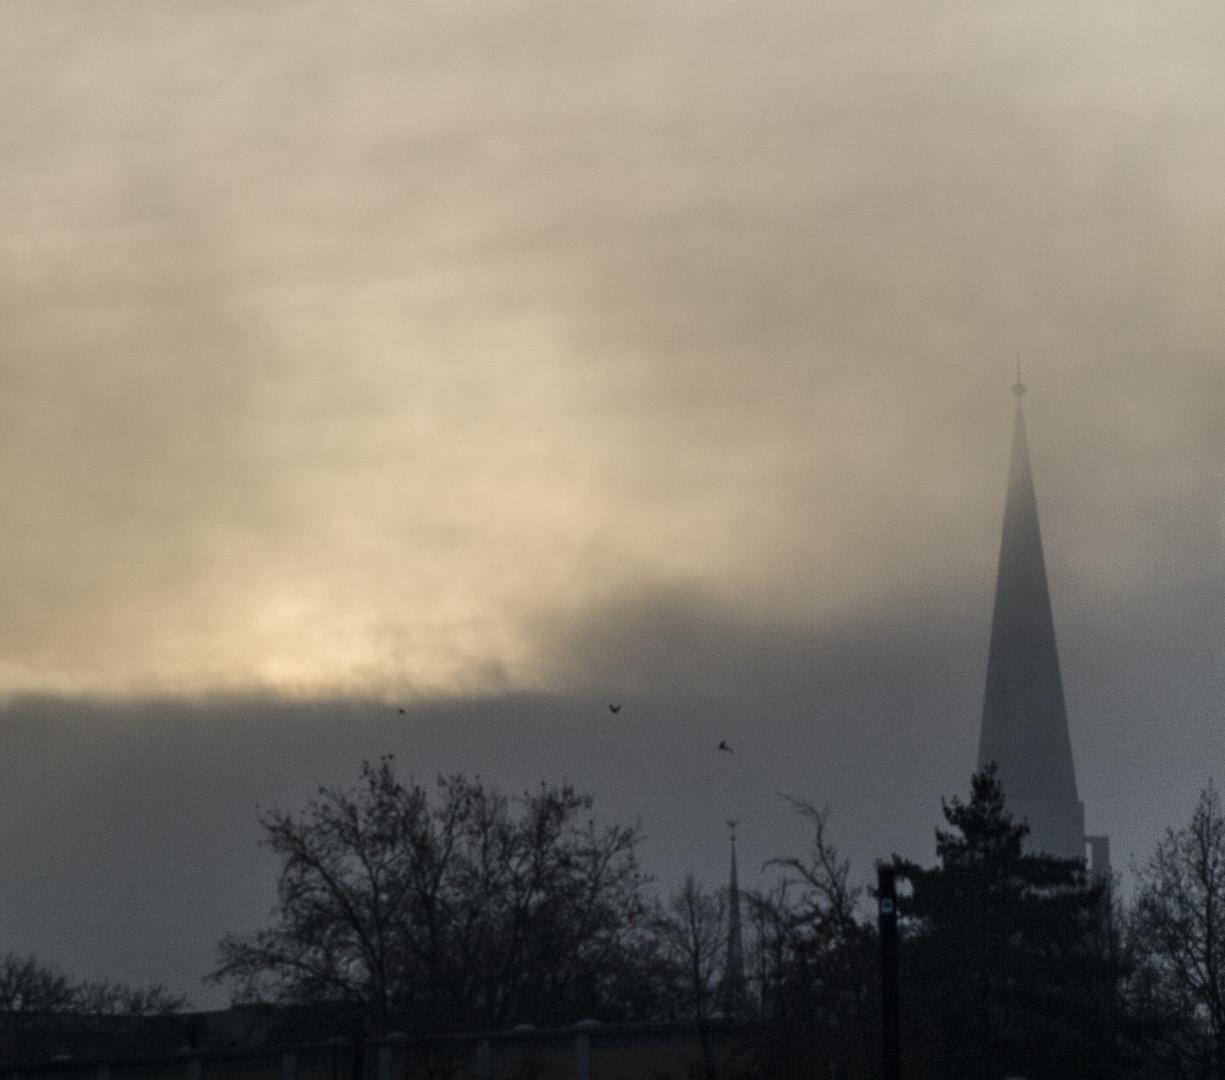 Bielefelder Kirchturm im Nebel